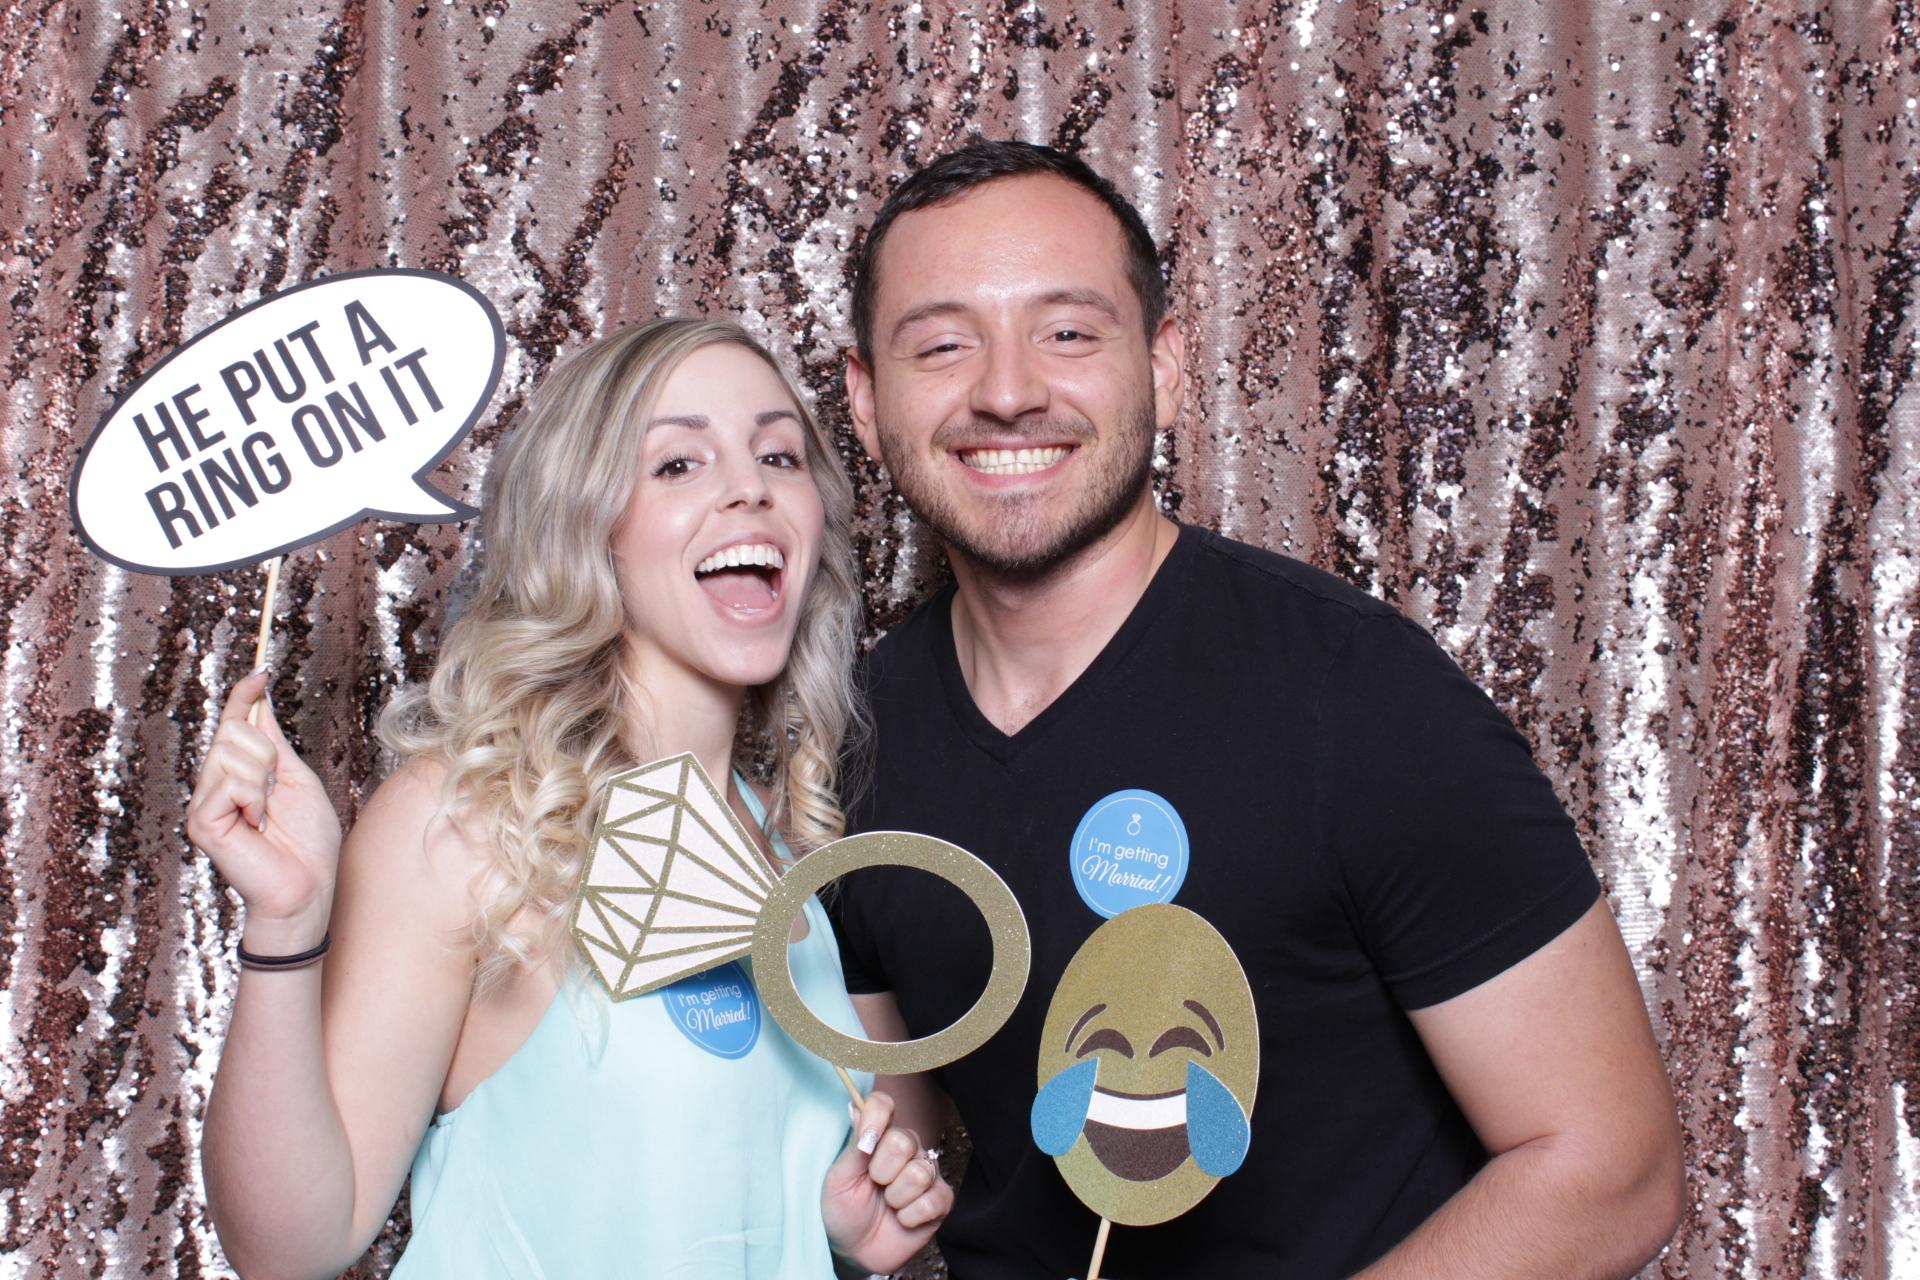 Arizona Bridal Show 2018 - Phoenix Convention Center, Phoenix, AZ01/06/2018 & 01/07/2018